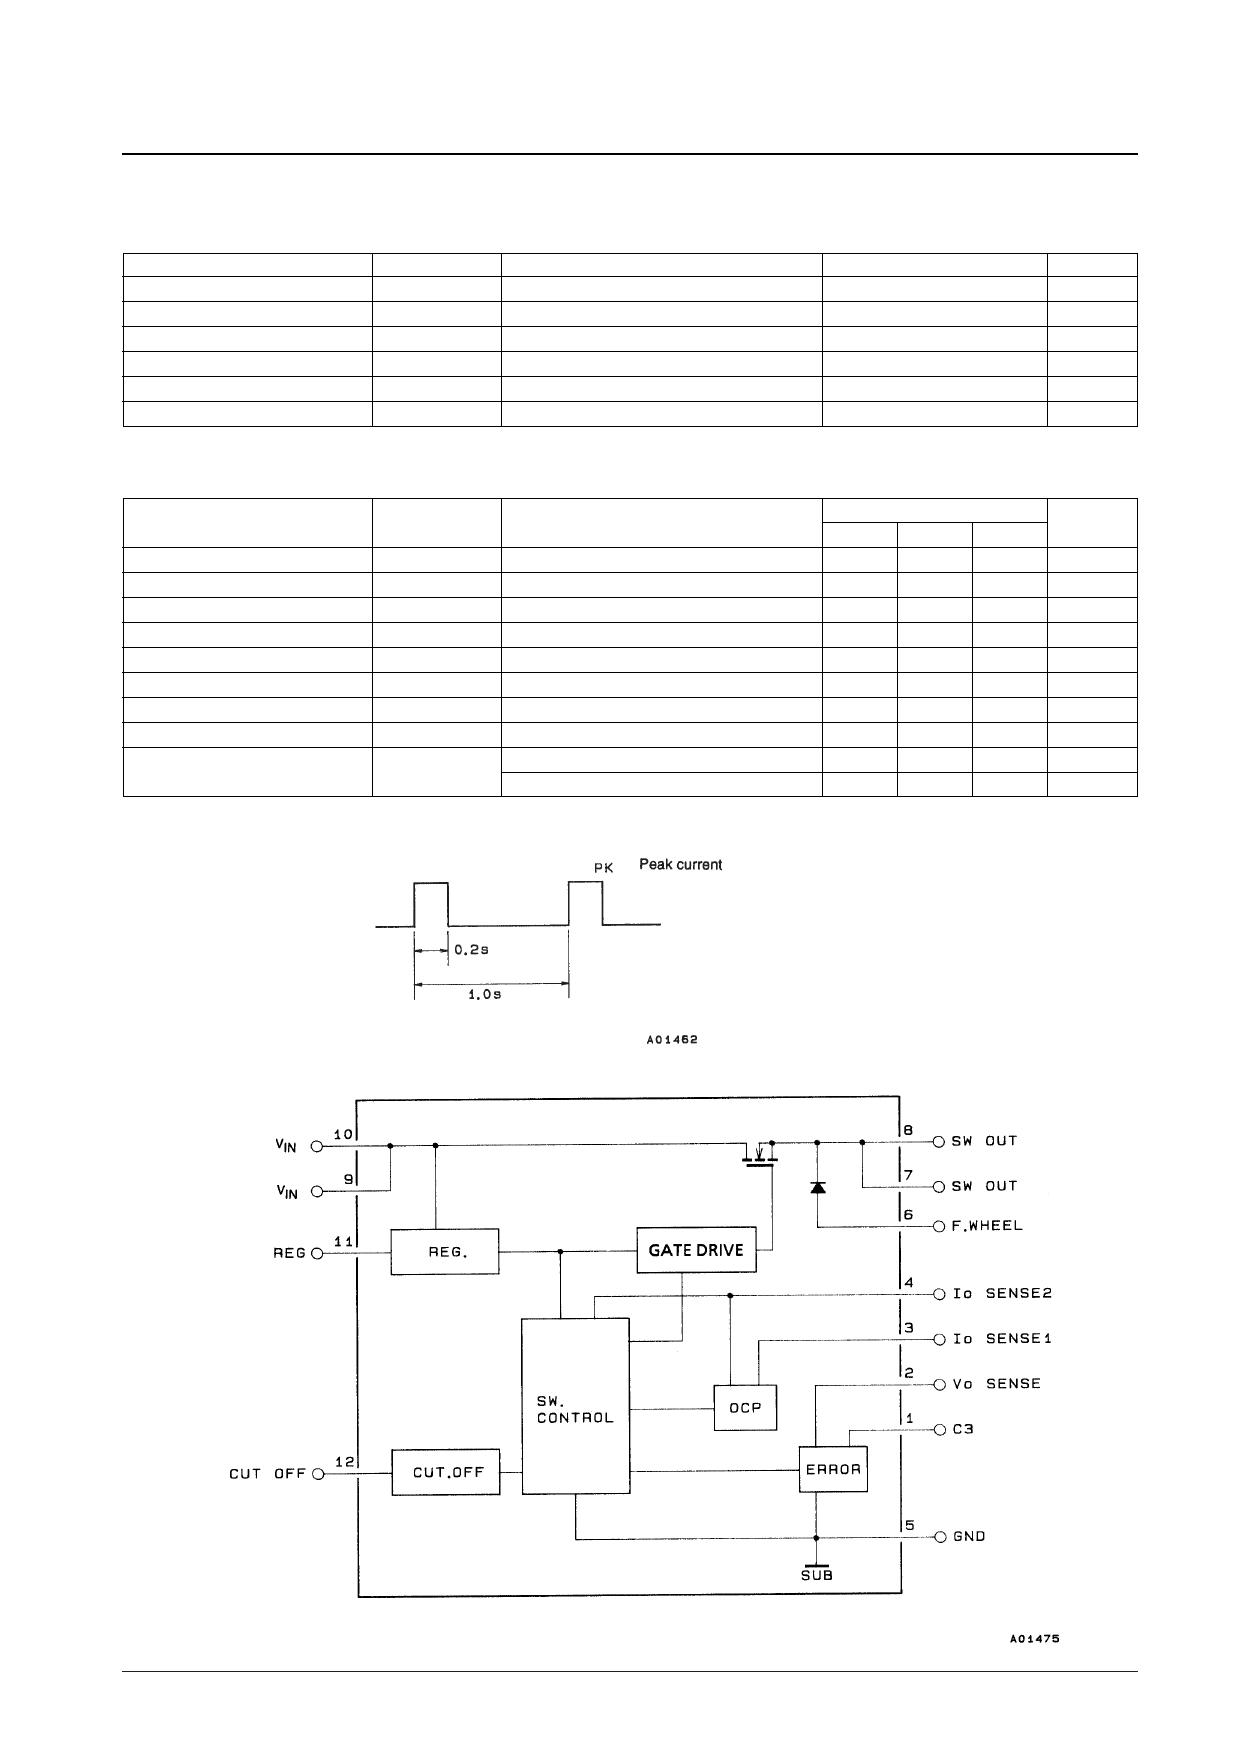 STK732C pdf, schematic